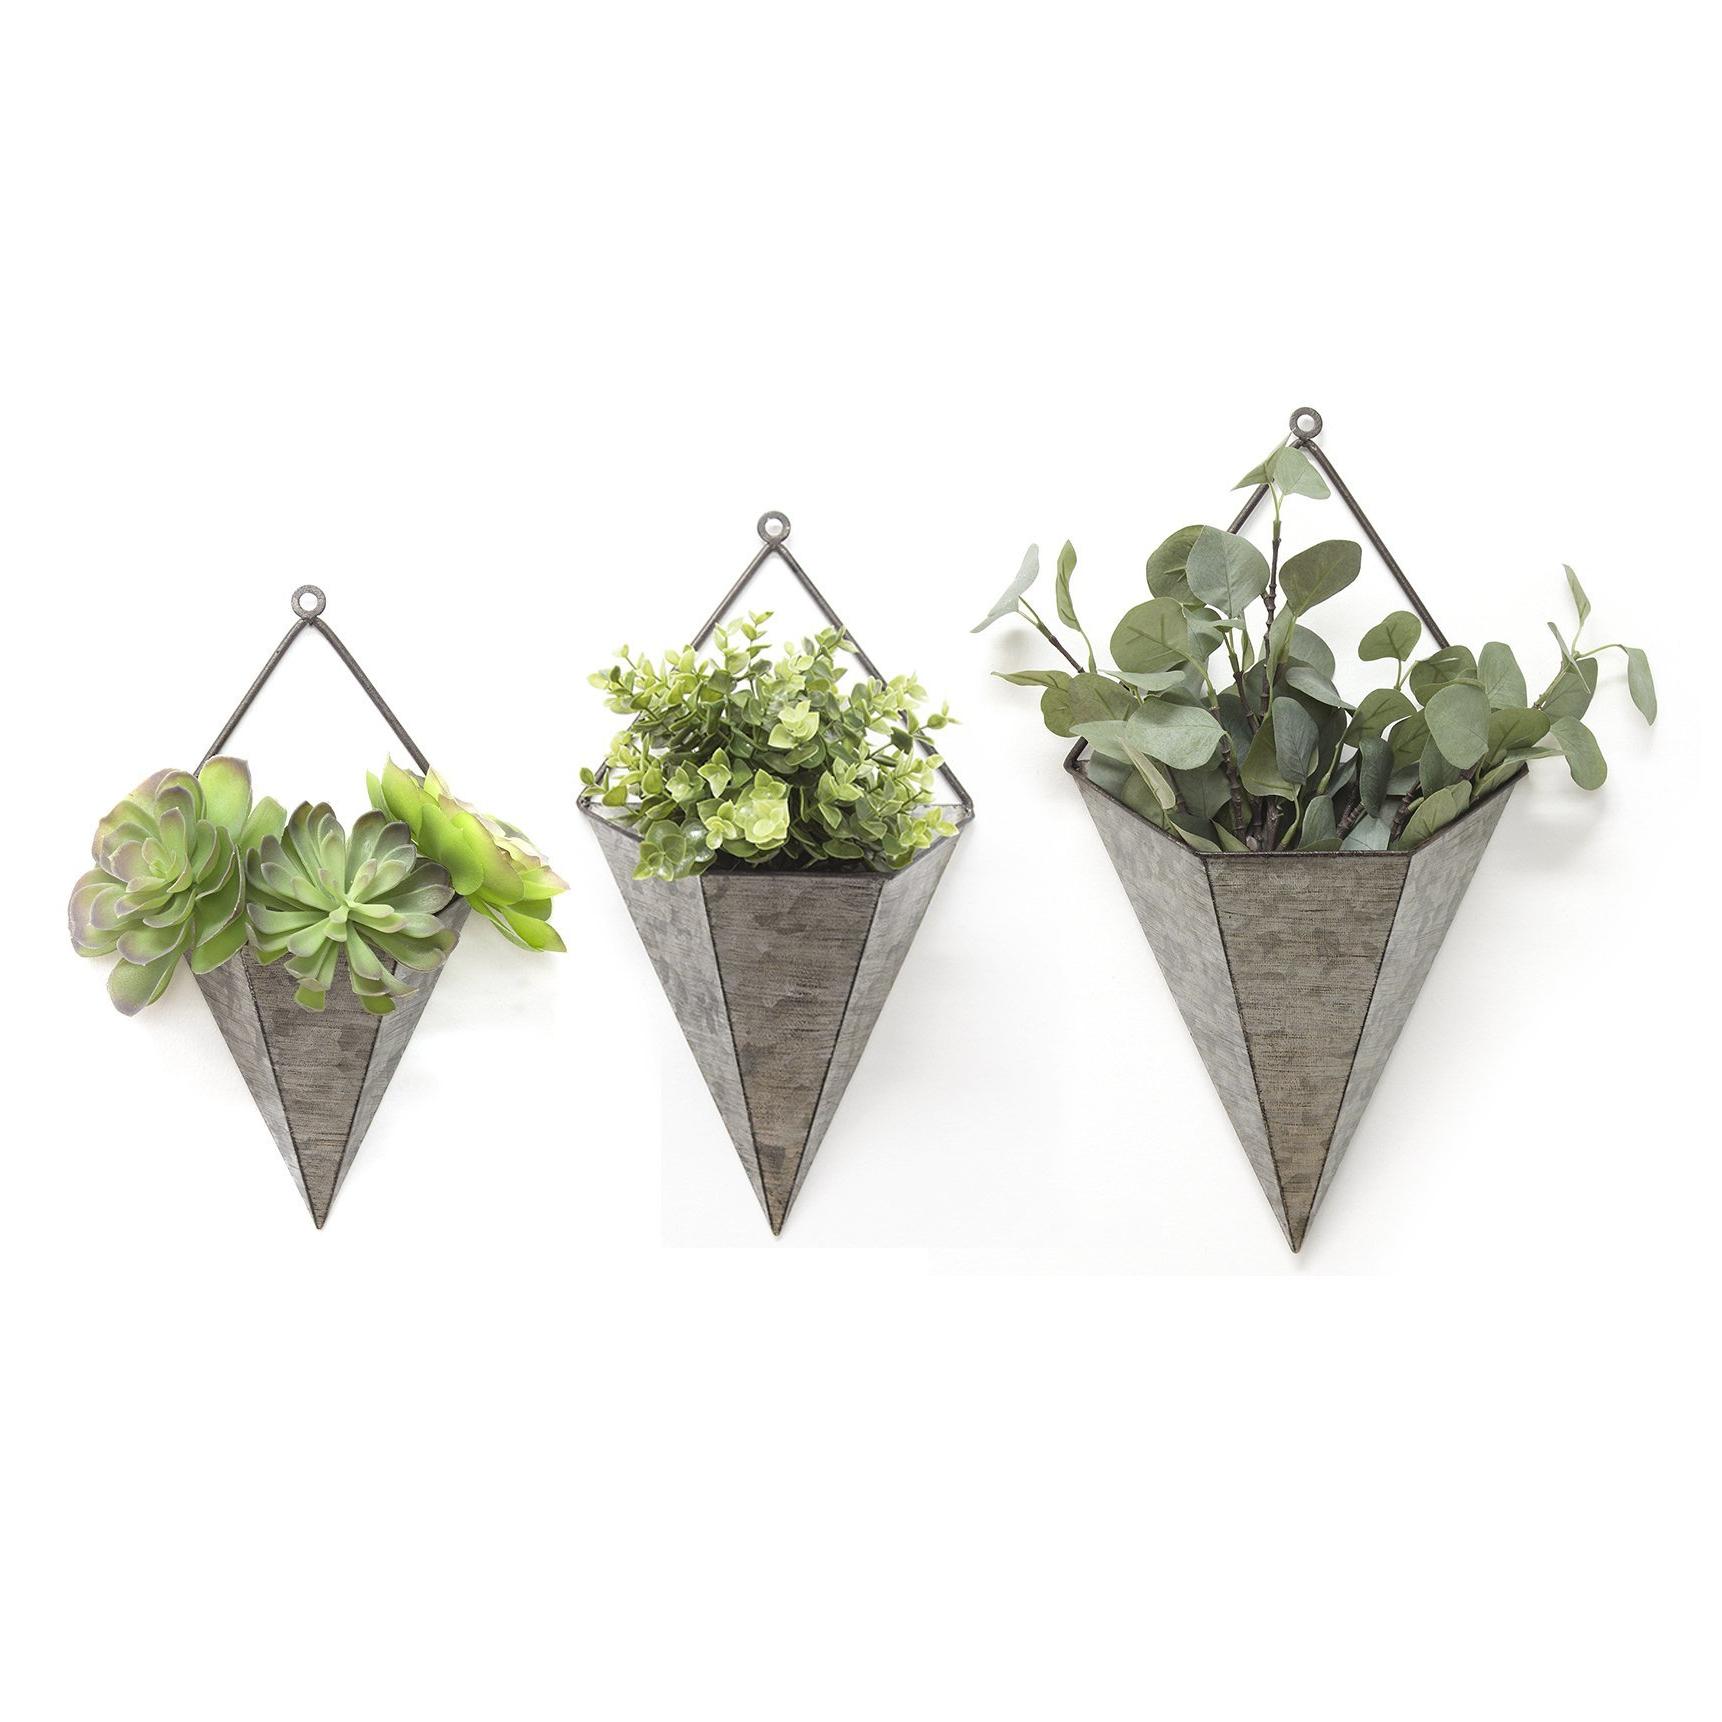 Amoroso Triangular Galvanized 3 Piece Metal Wall Planters Set Regarding Best And Newest Wallflower 3 Piece Dining Sets (View 2 of 25)